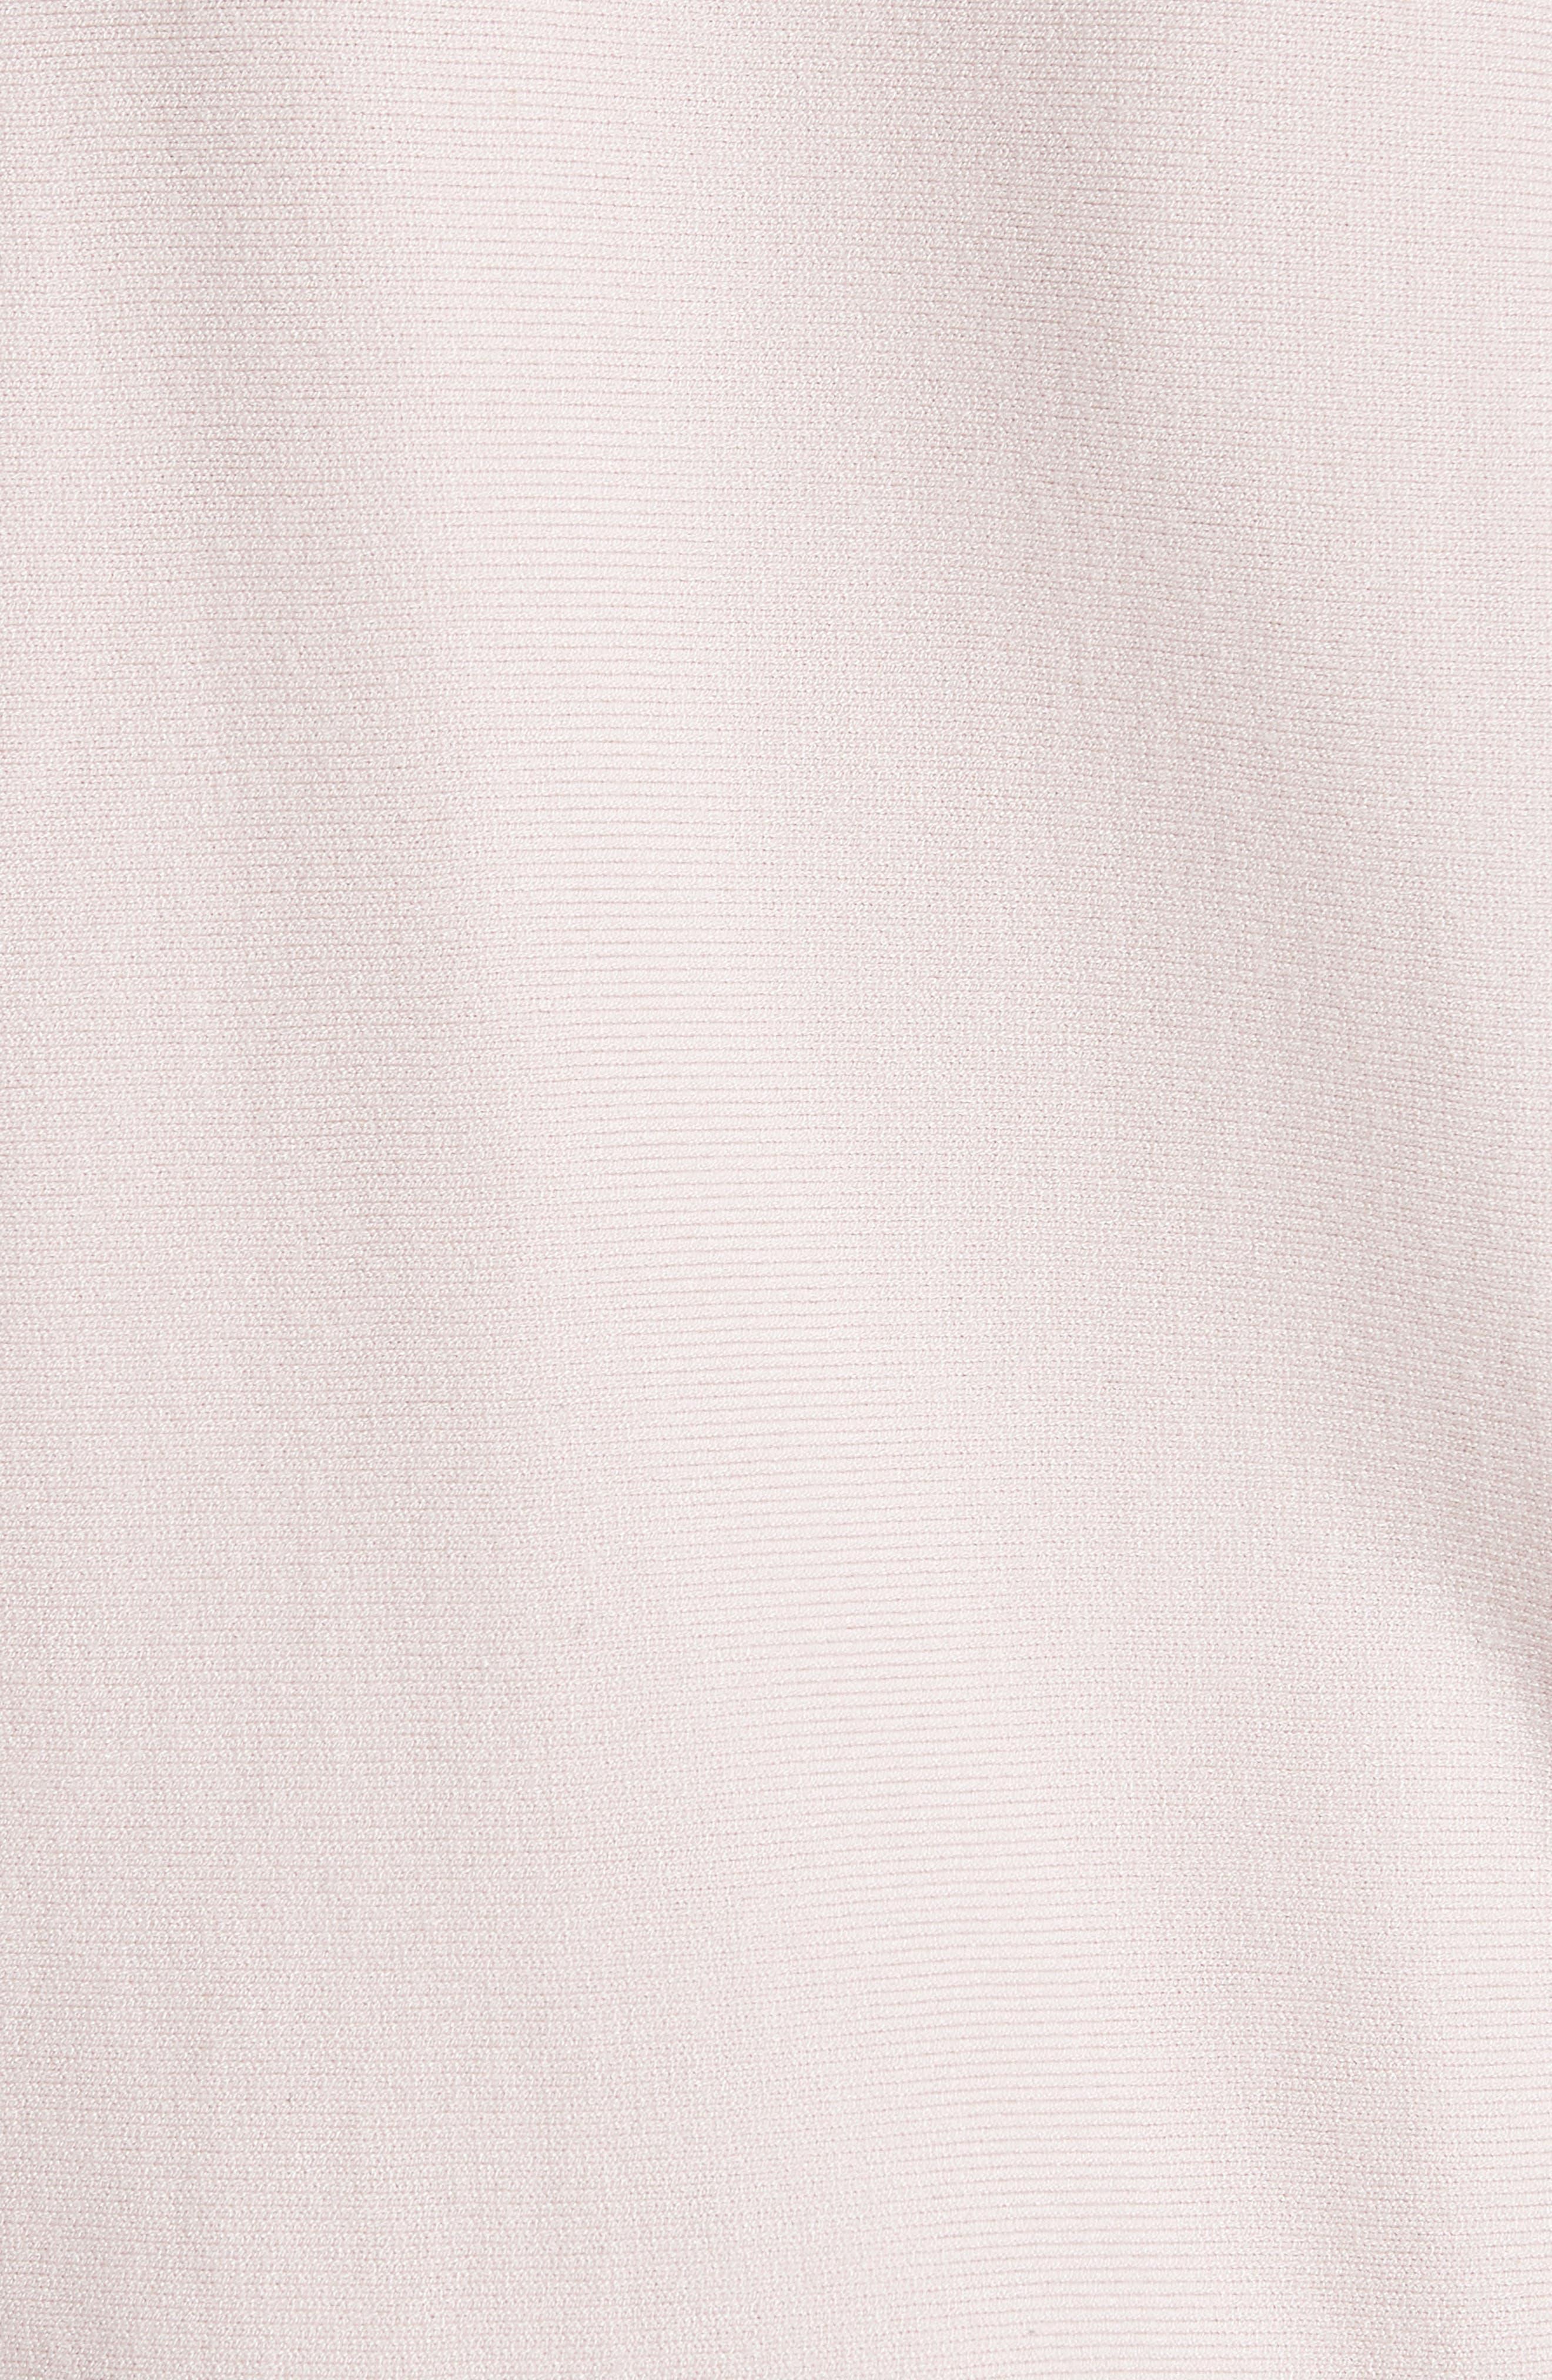 MILLY,                             Faux Gem Embellished Sweater,                             Alternate thumbnail 5, color,                             BALLET